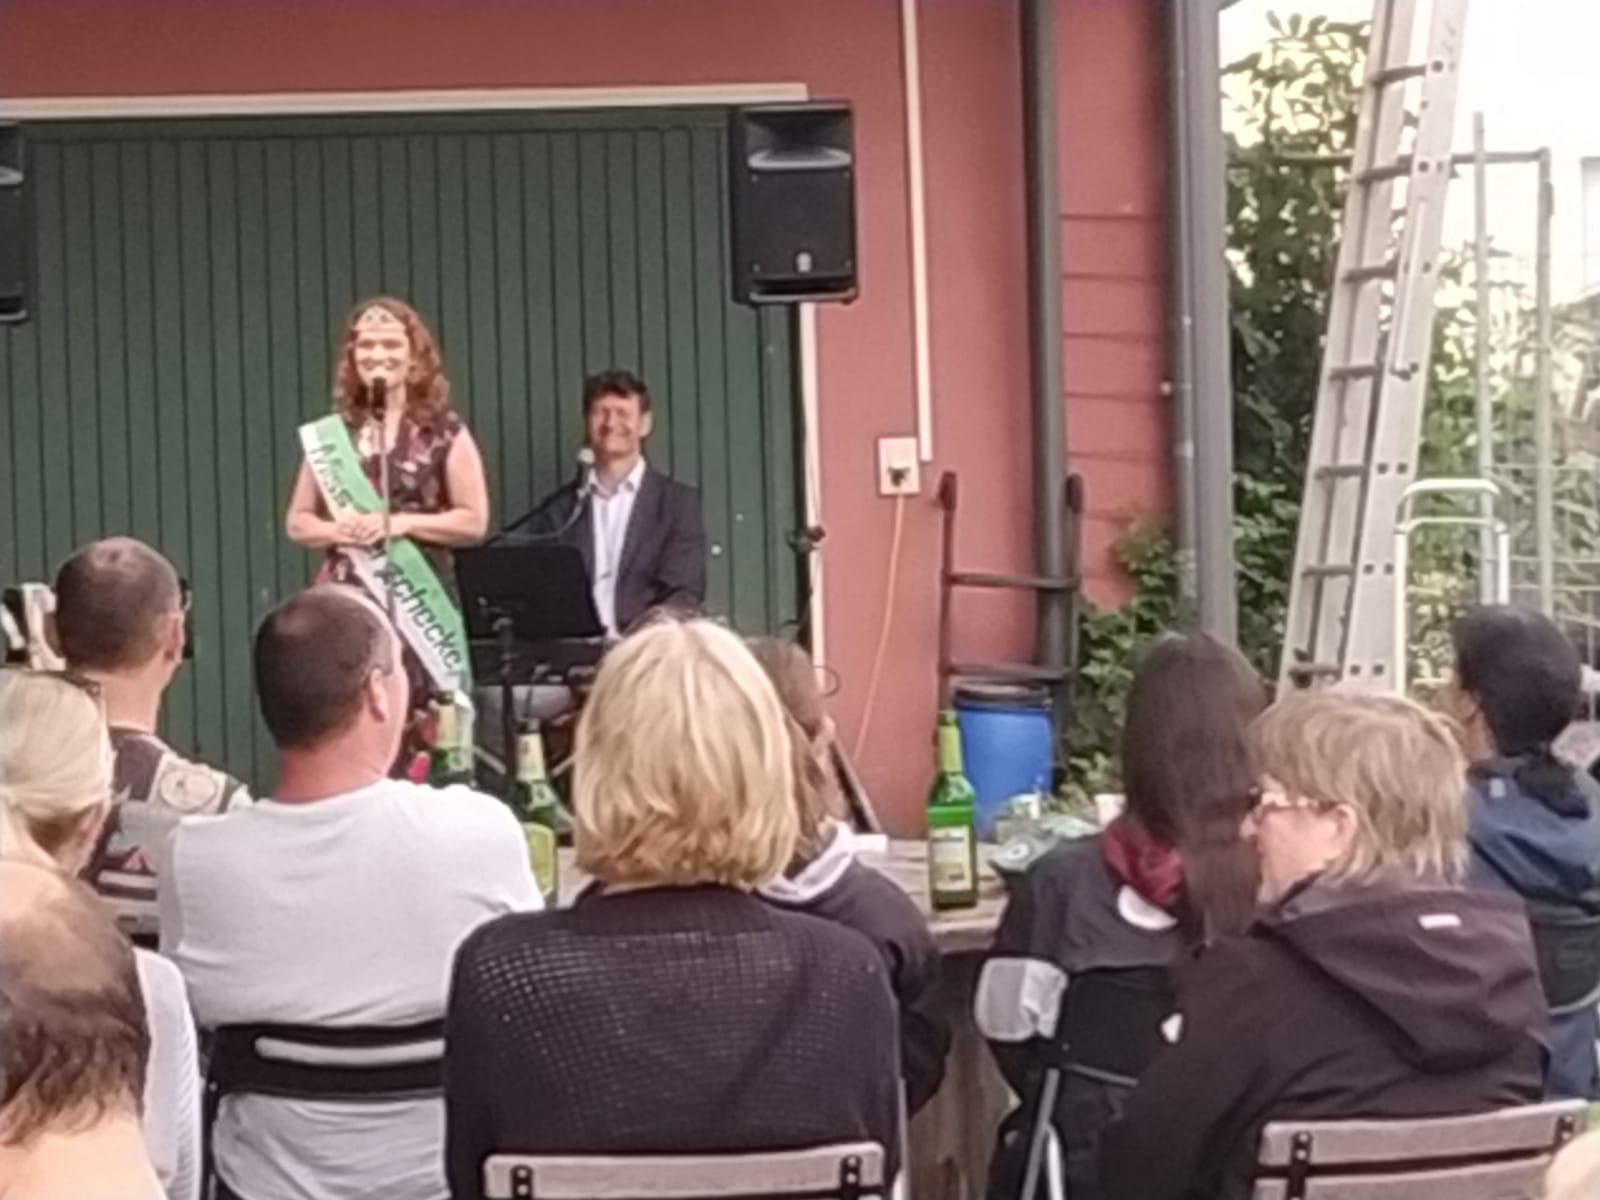 Gartenstuhlkonzert mit Katy-Leen